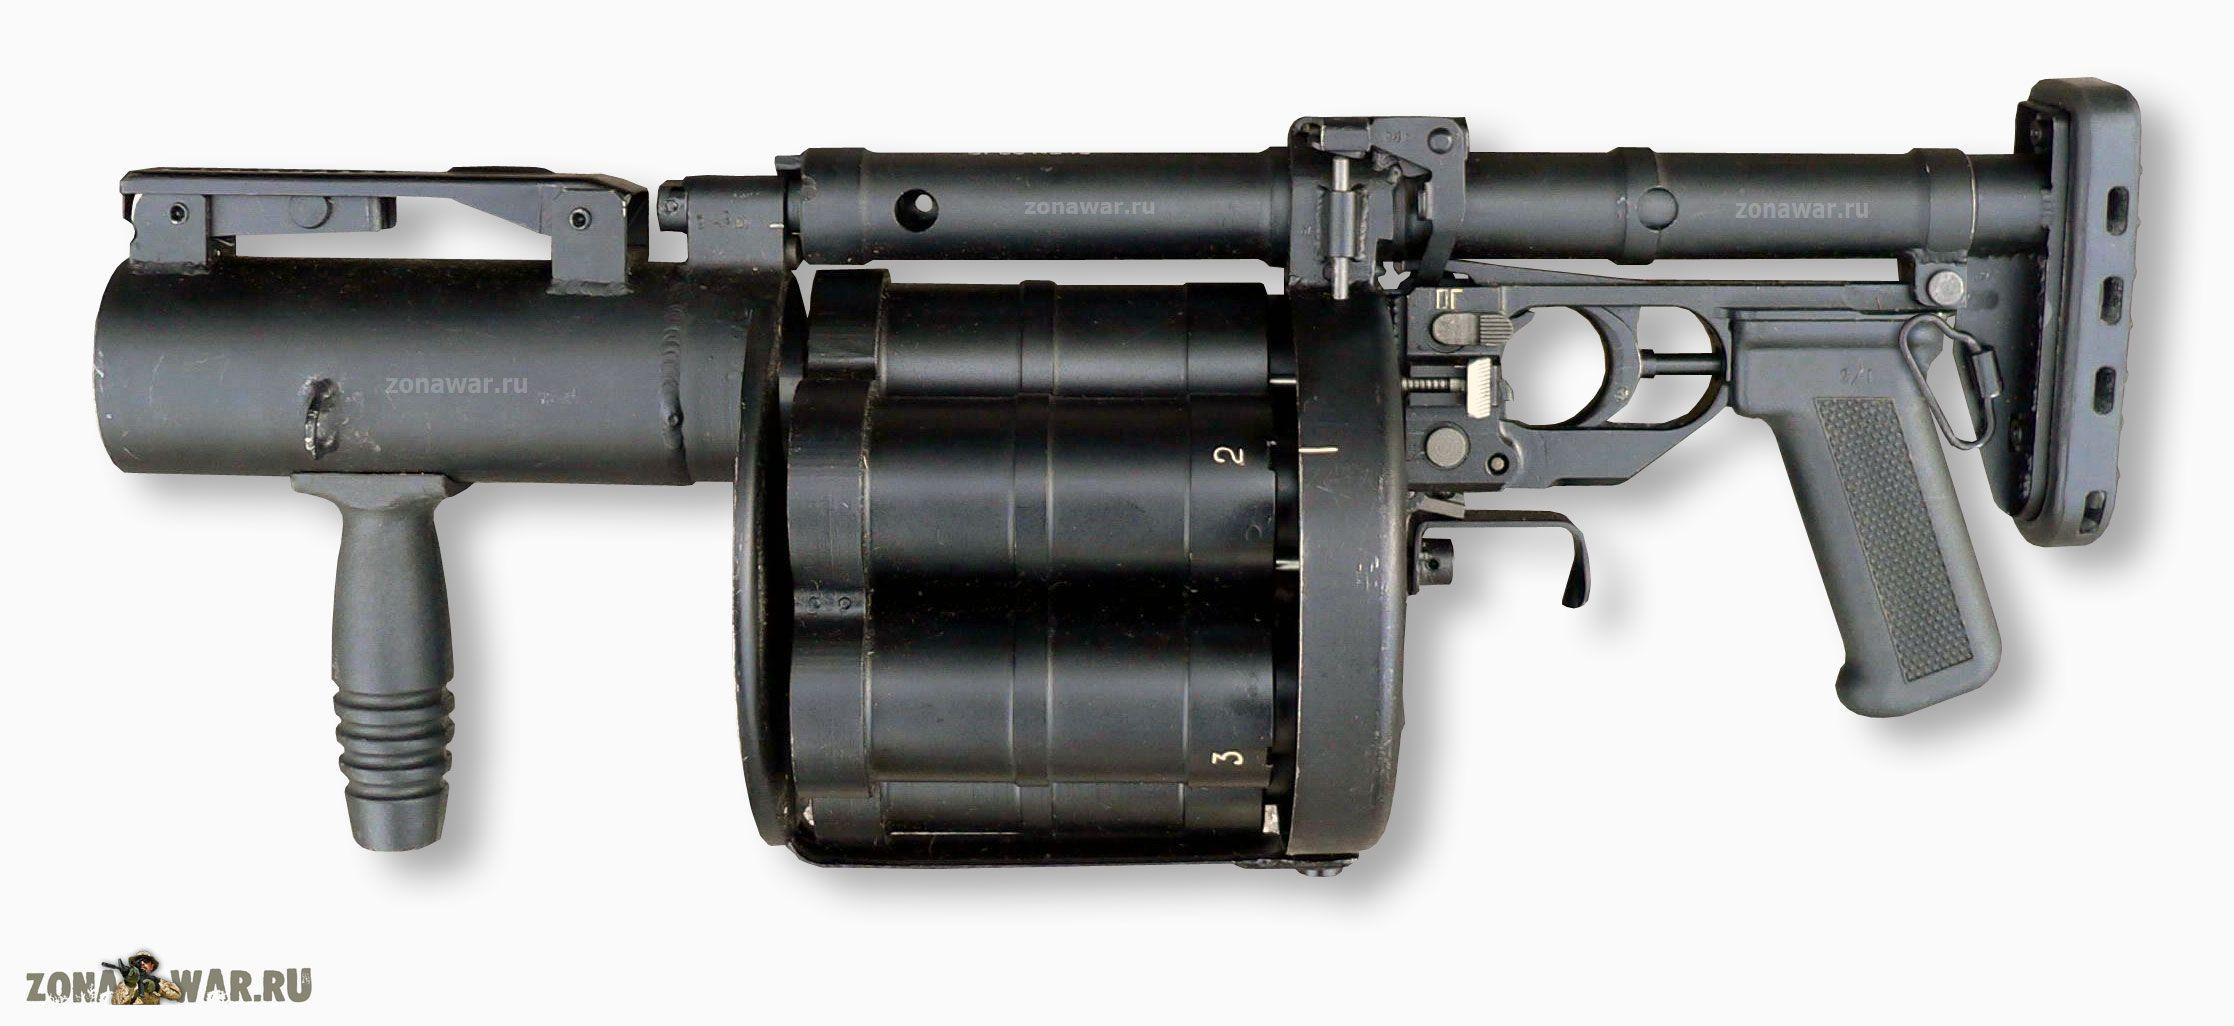 Hand grenade RGD 5 wallpaper Weapon wallpapers Pinterest